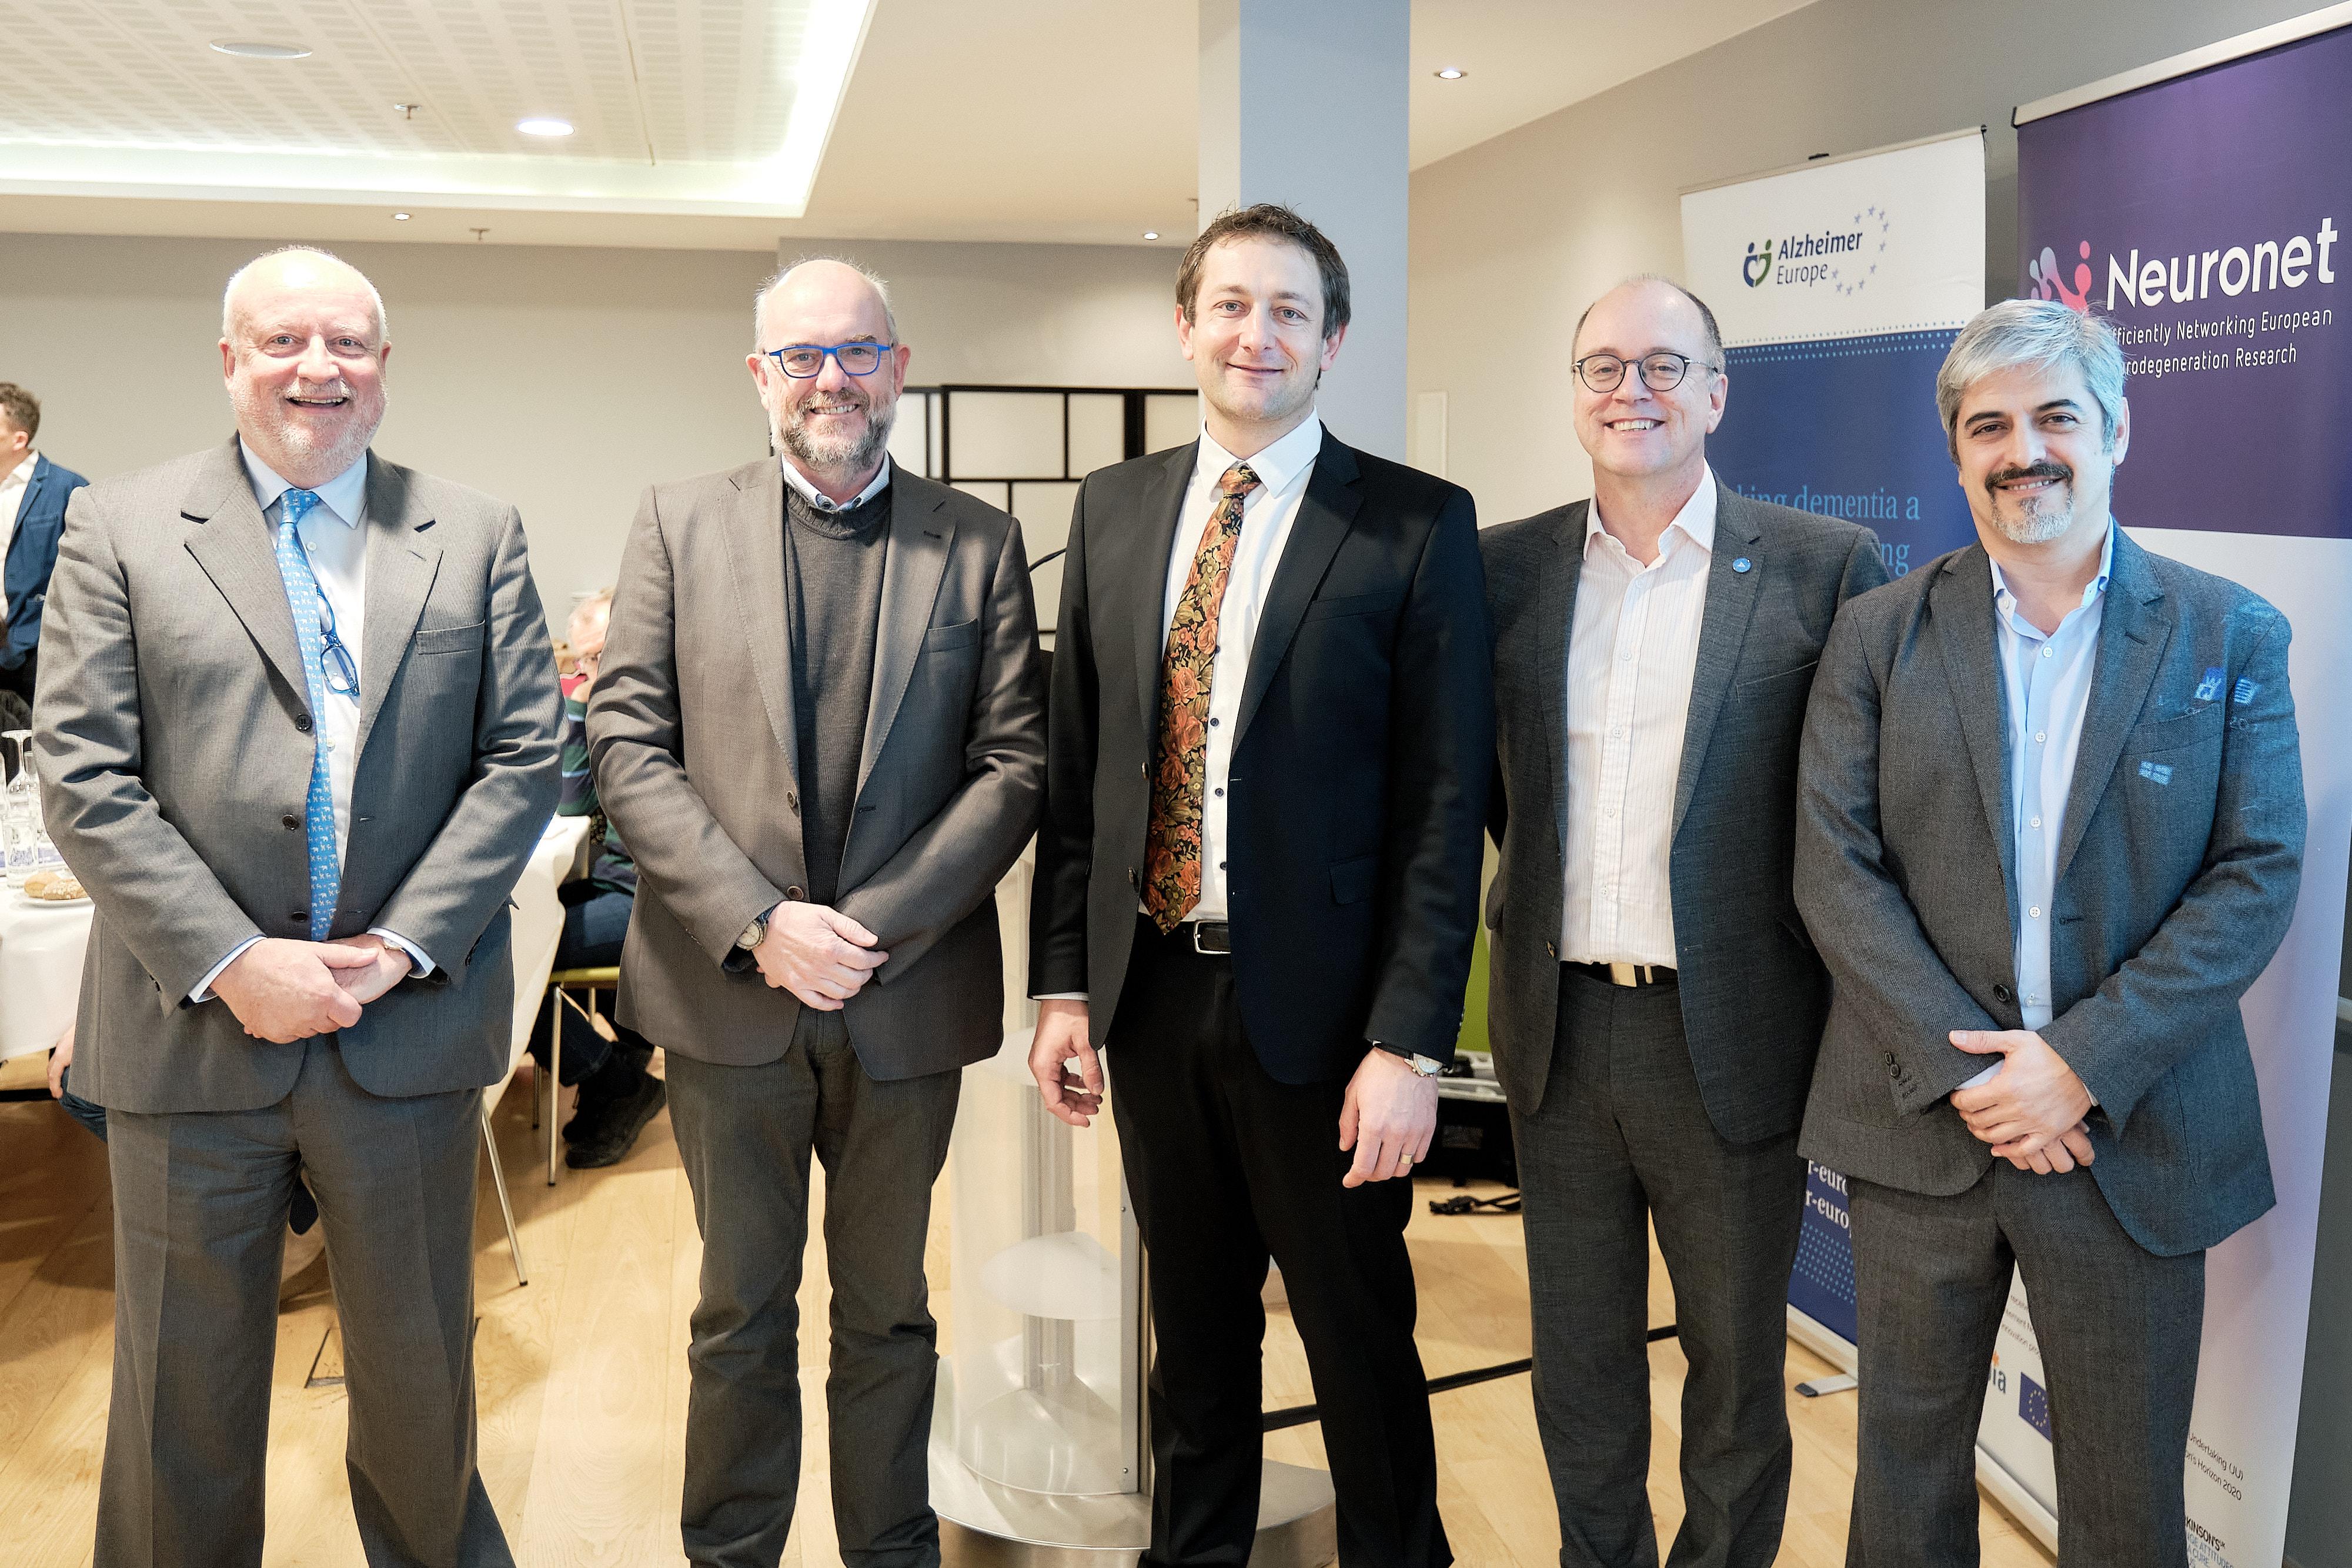 The IMI Advancing Alzheimer's research through public-private partnerships, Pierre Meulien, Bart Vannieuwenhuyse, Christophe Hansen, Jean Georges, Carlos Diaz